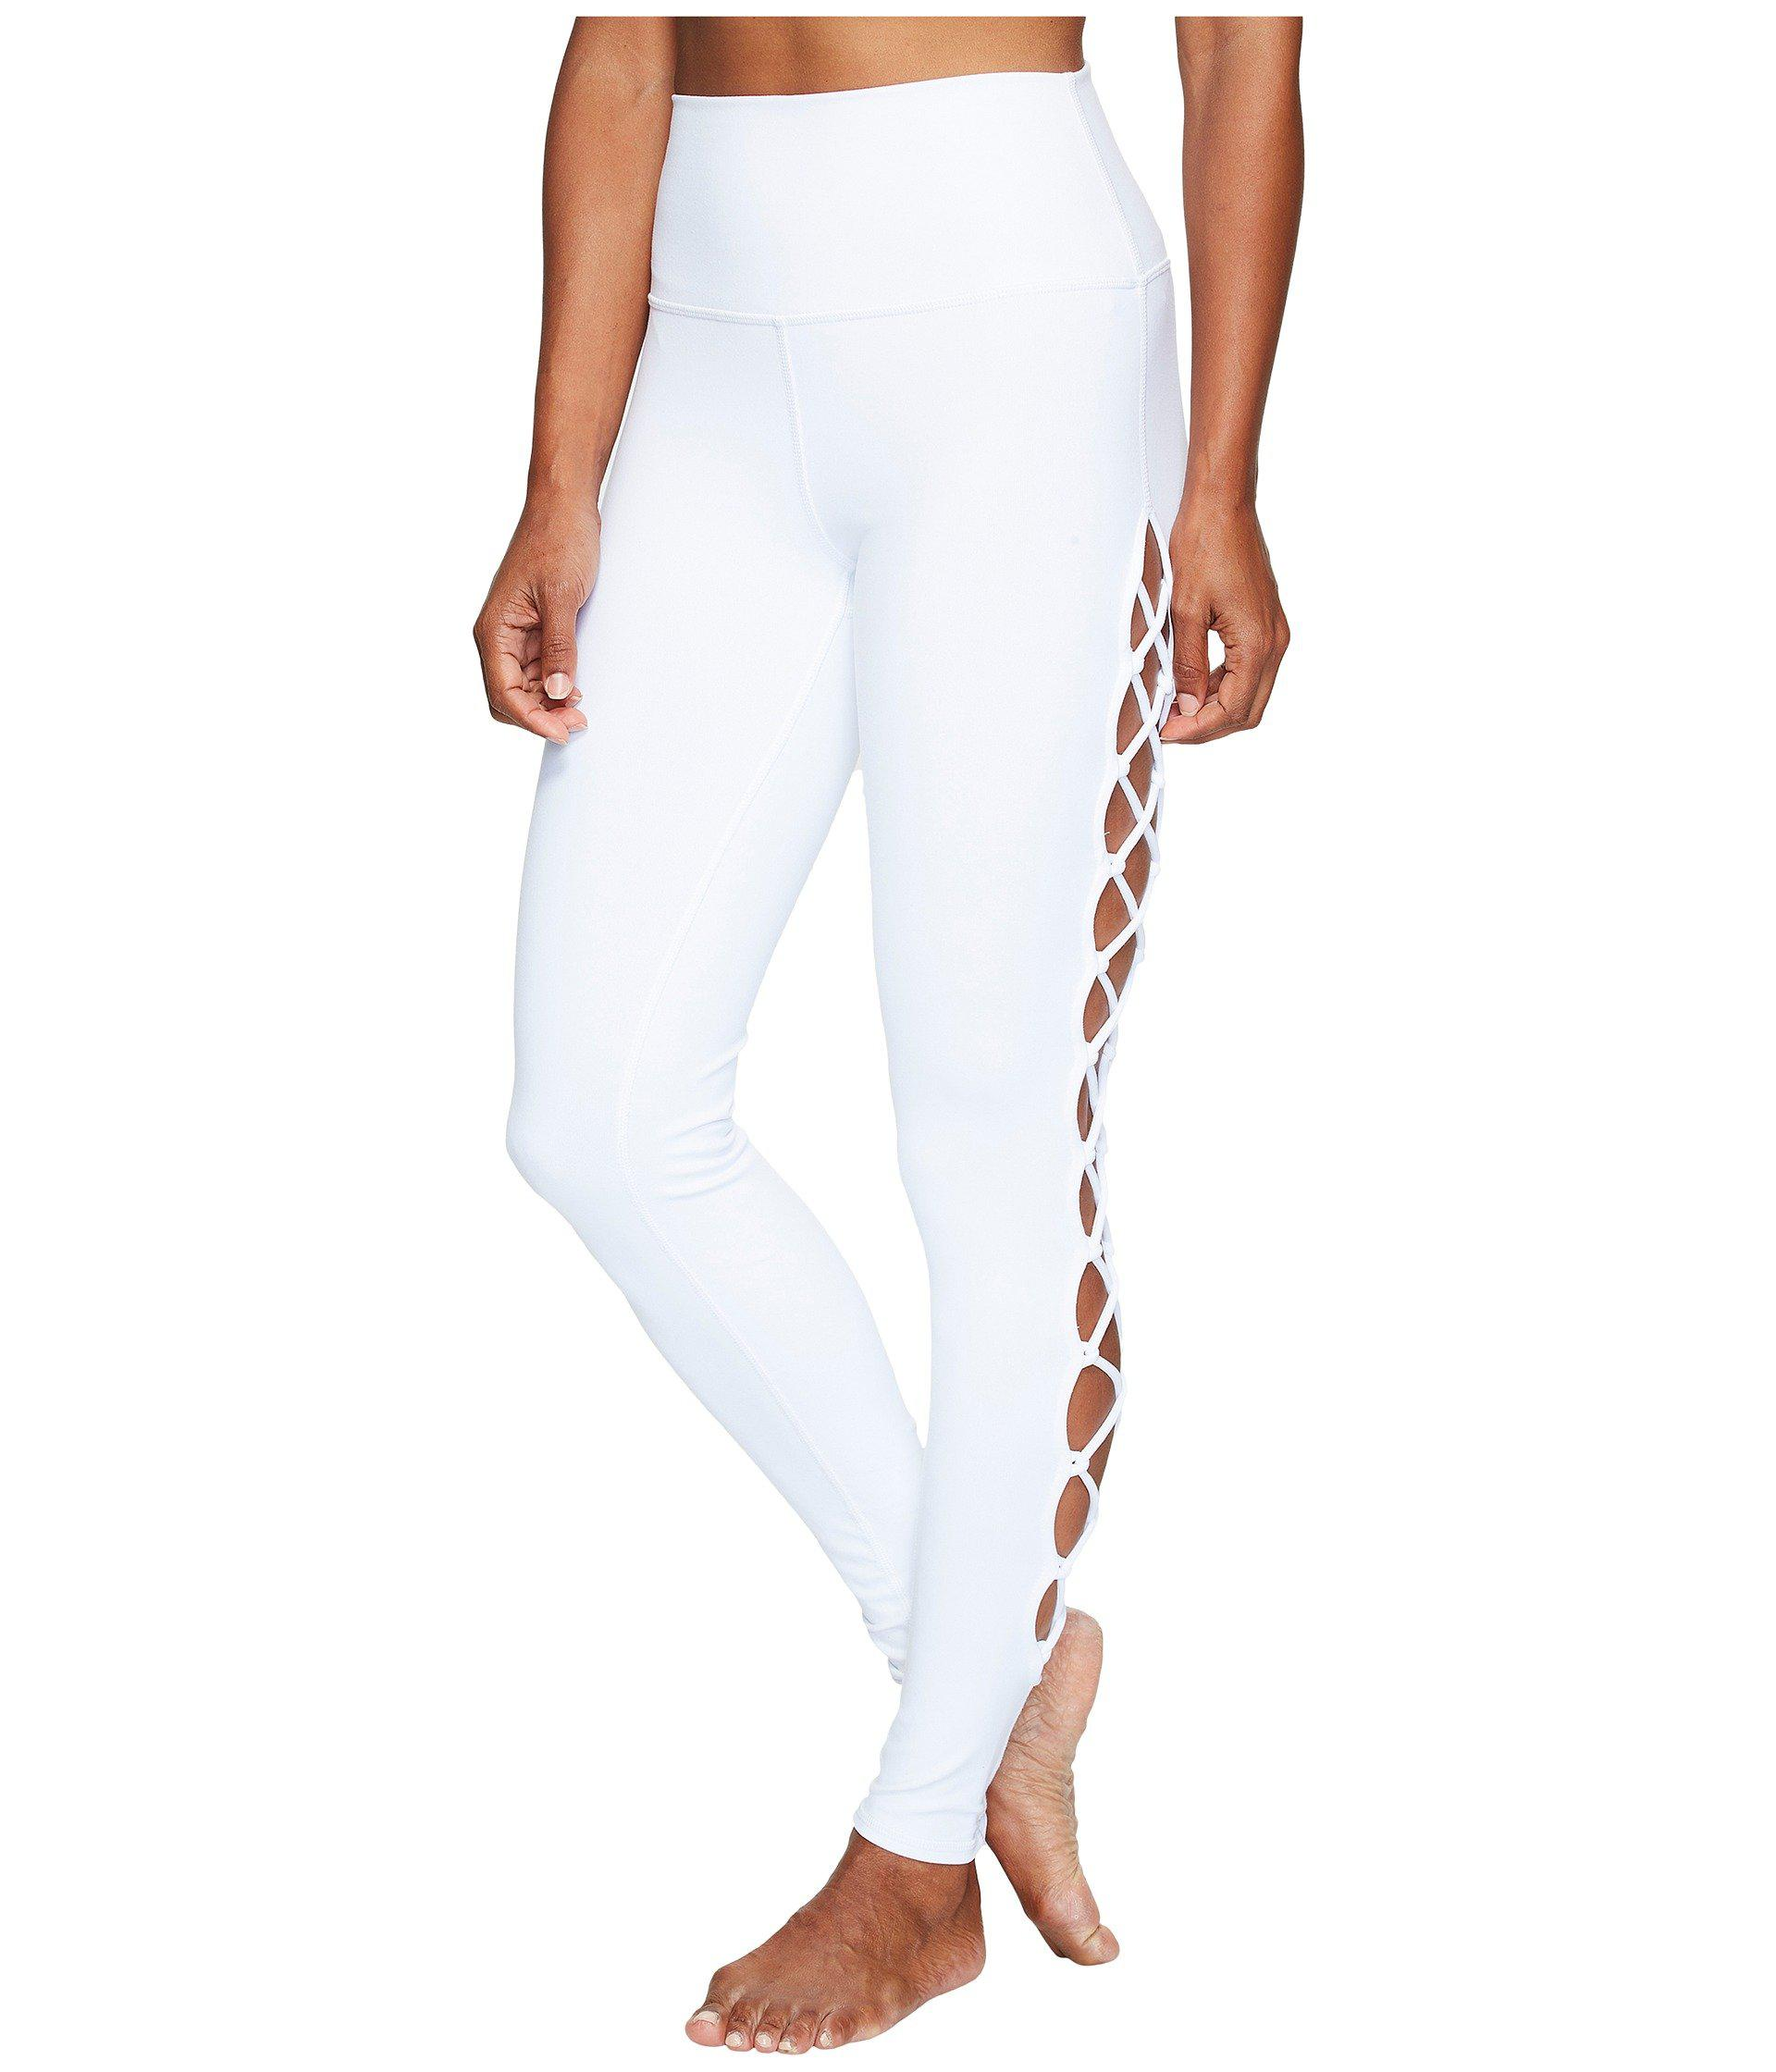 5e3c5e2c5d Alo Yoga Interlace Leggings (white) Women's Casual Pants in White - Lyst